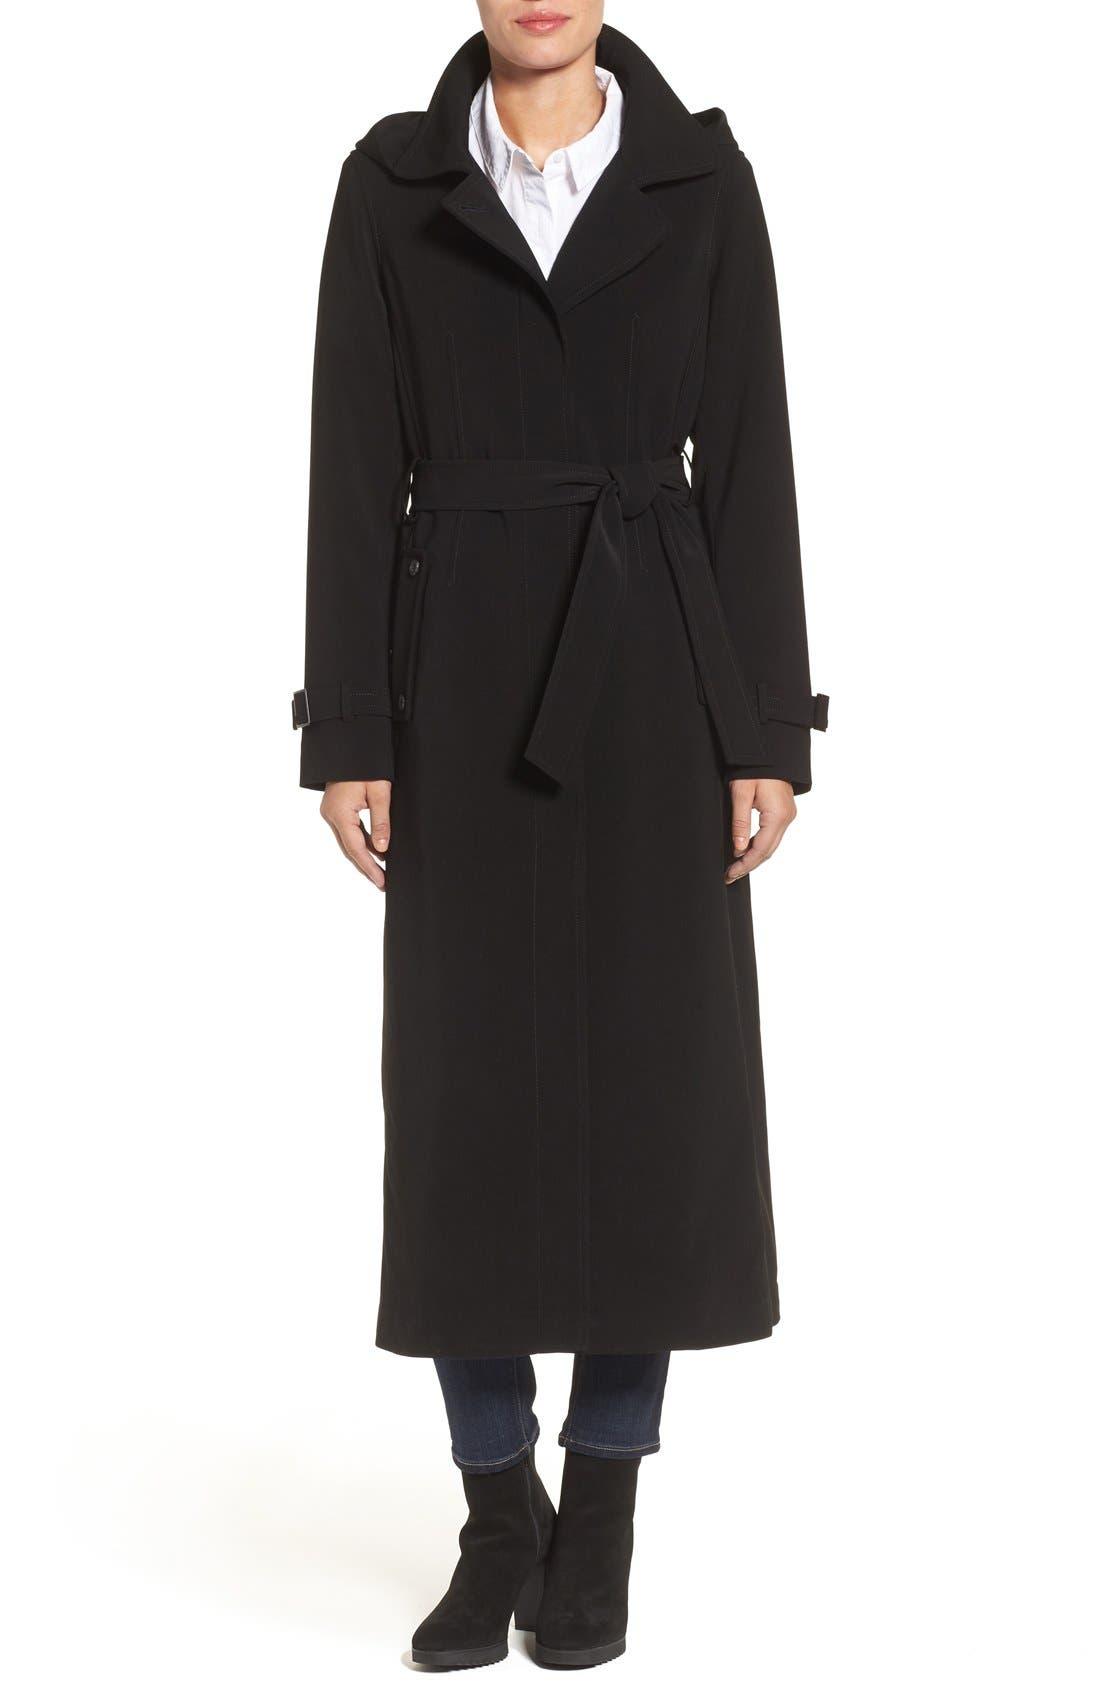 Petite long black trench coat